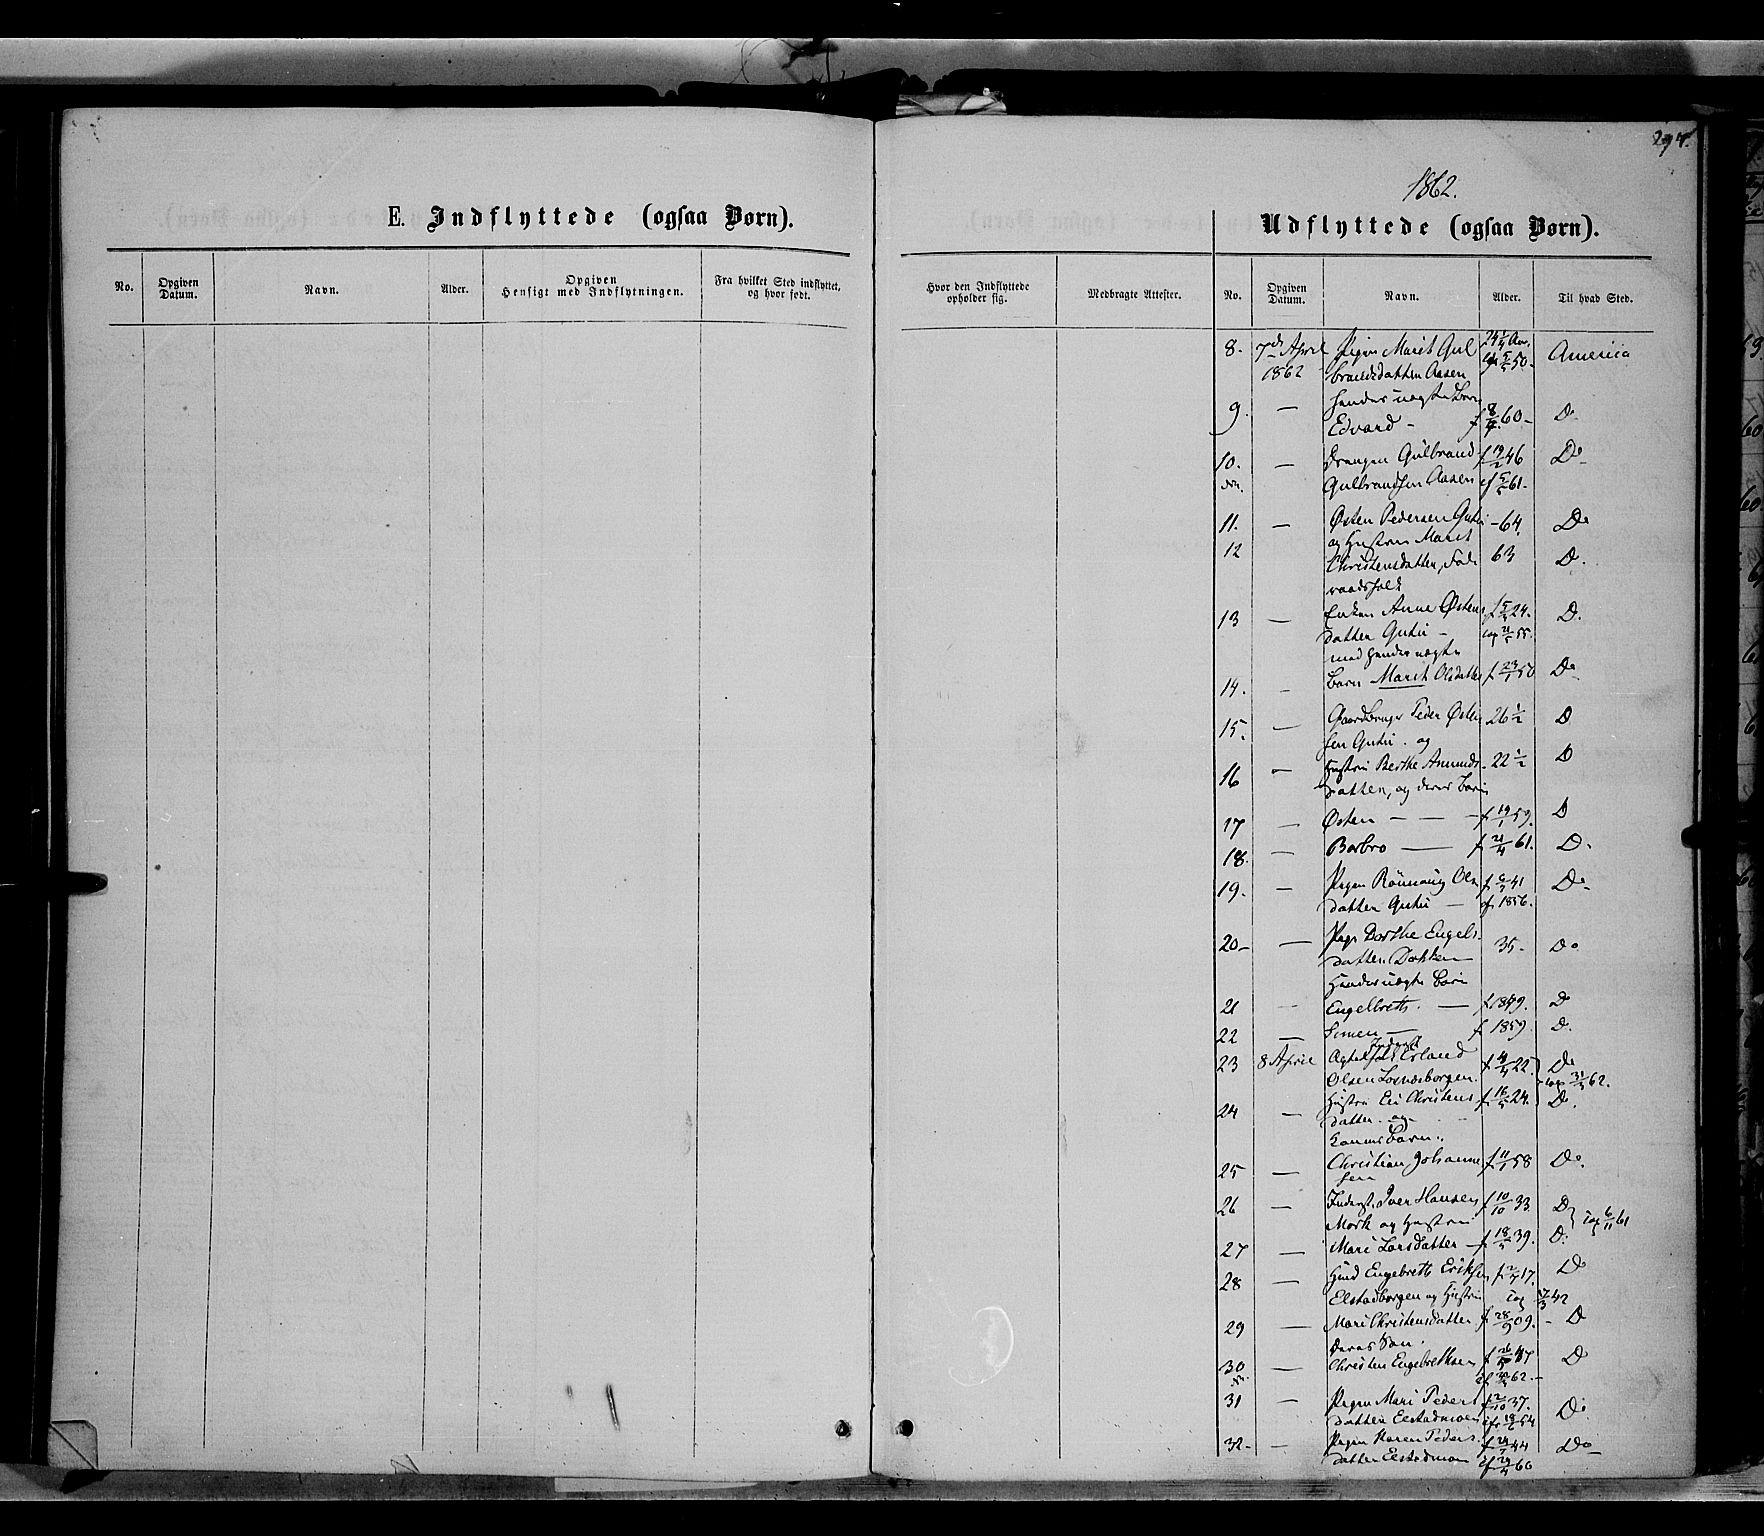 SAH, Ringebu prestekontor, Ministerialbok nr. 7, 1860-1877, s. 294